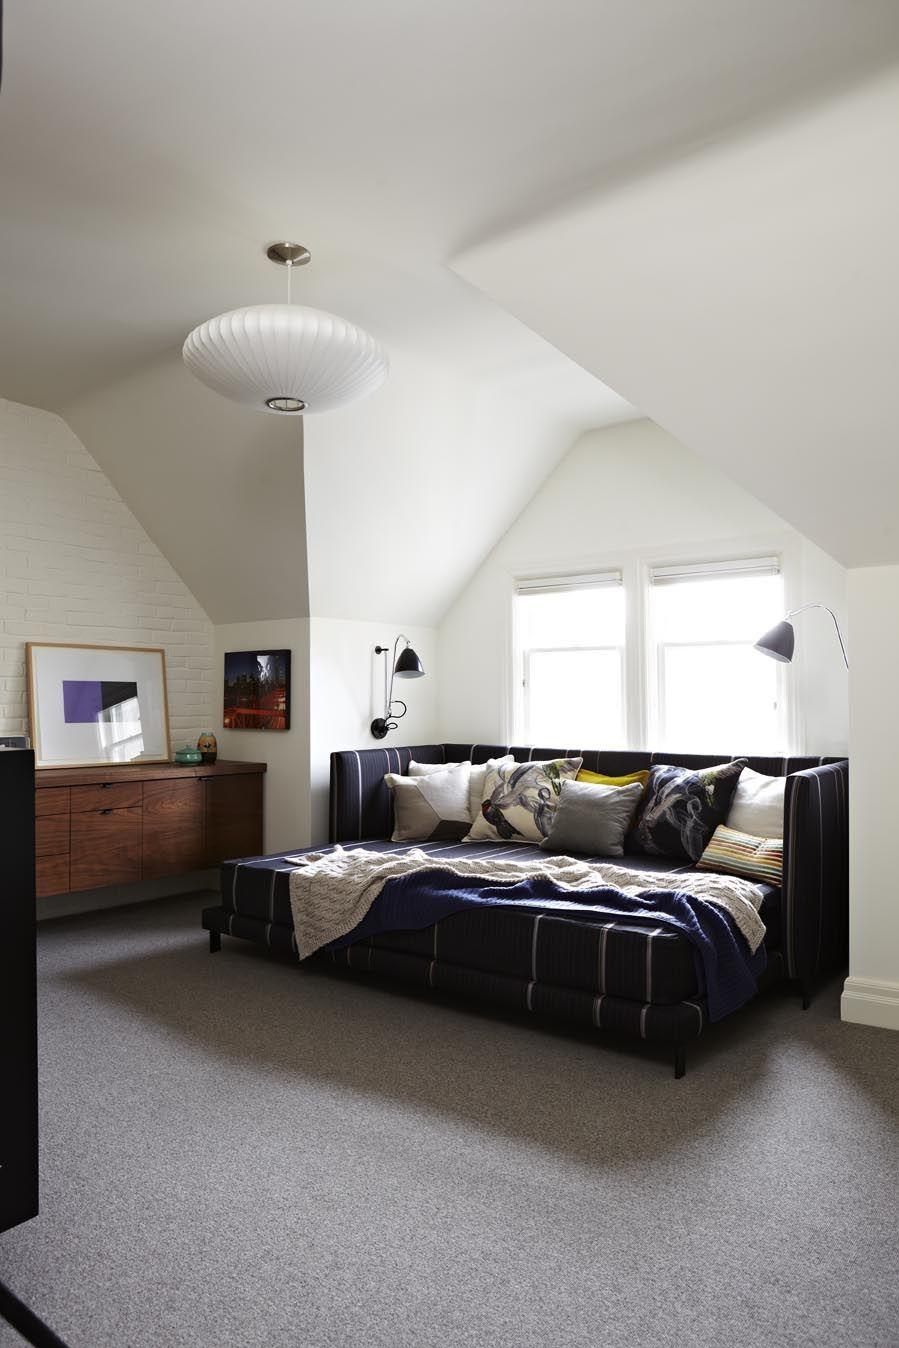 Diy Inspiration Daybeds: Beautiful Room - Basement Inspiration